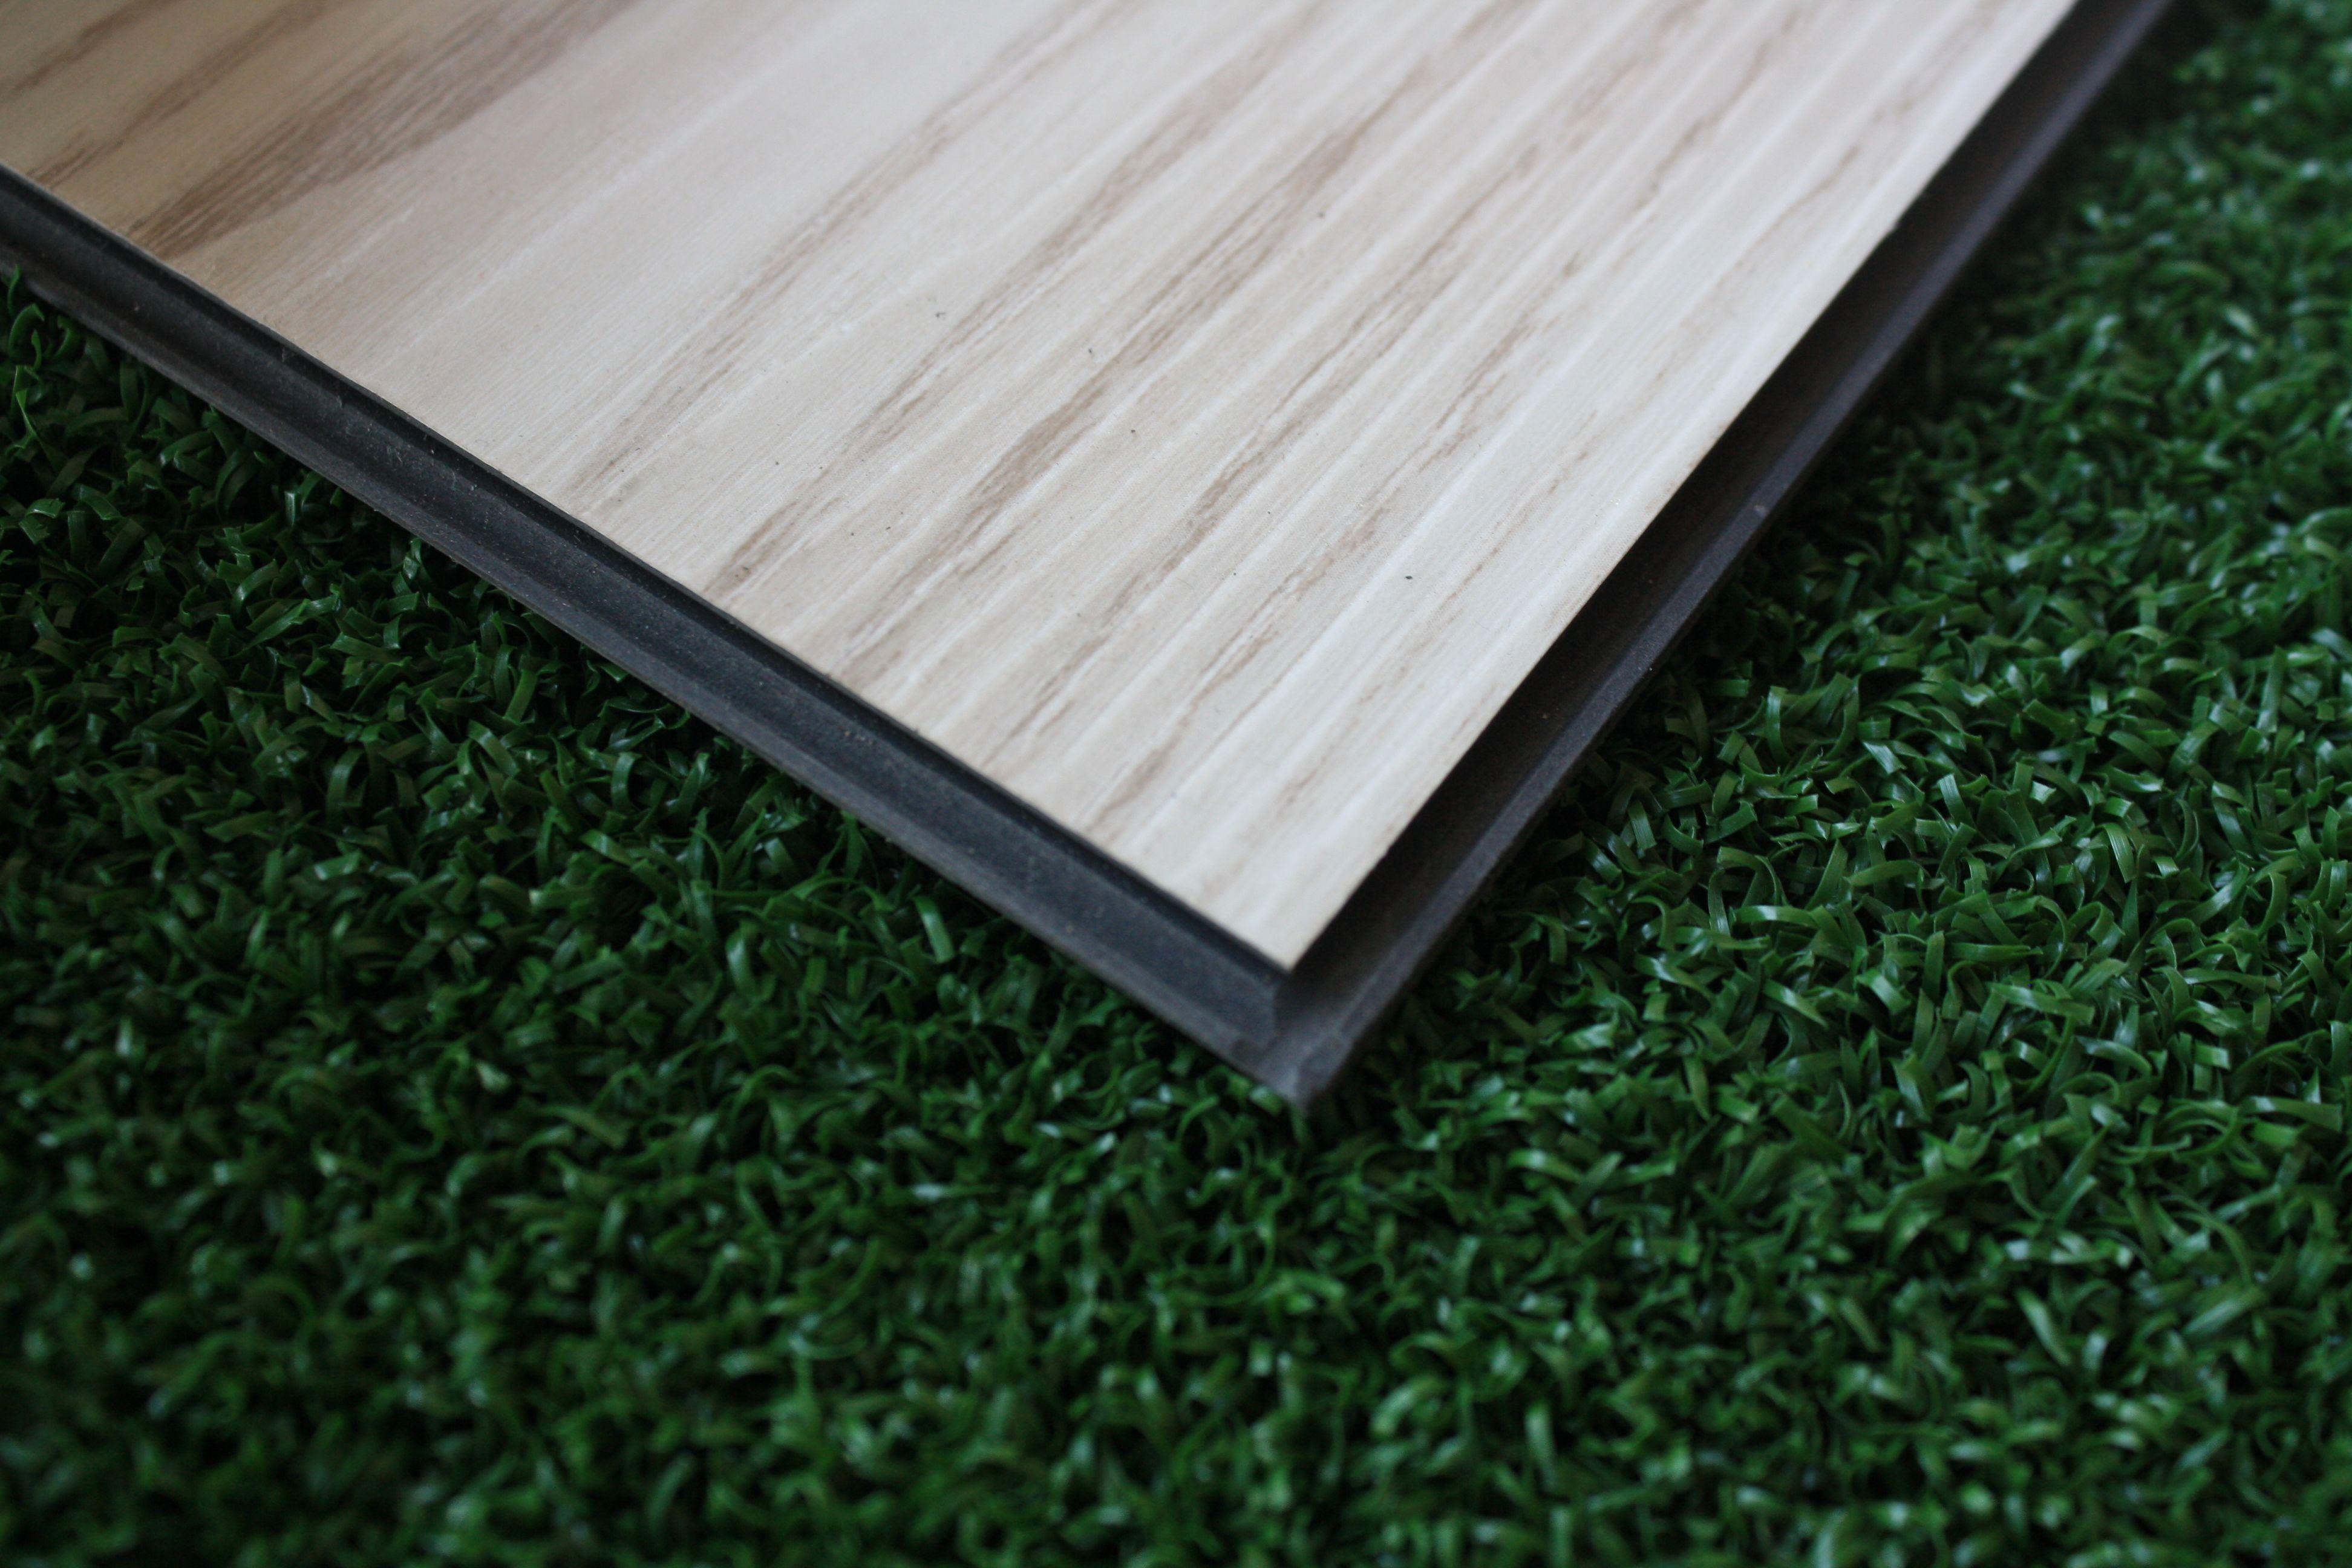 Hanflor Vinyl Floor Interlocking Glue Less Waterproof That Is The Interlocking Pvc Floor Hanflor Vinylfloorin Vinyl Flooring Vinyl Plank Flooring Vinyl Plank